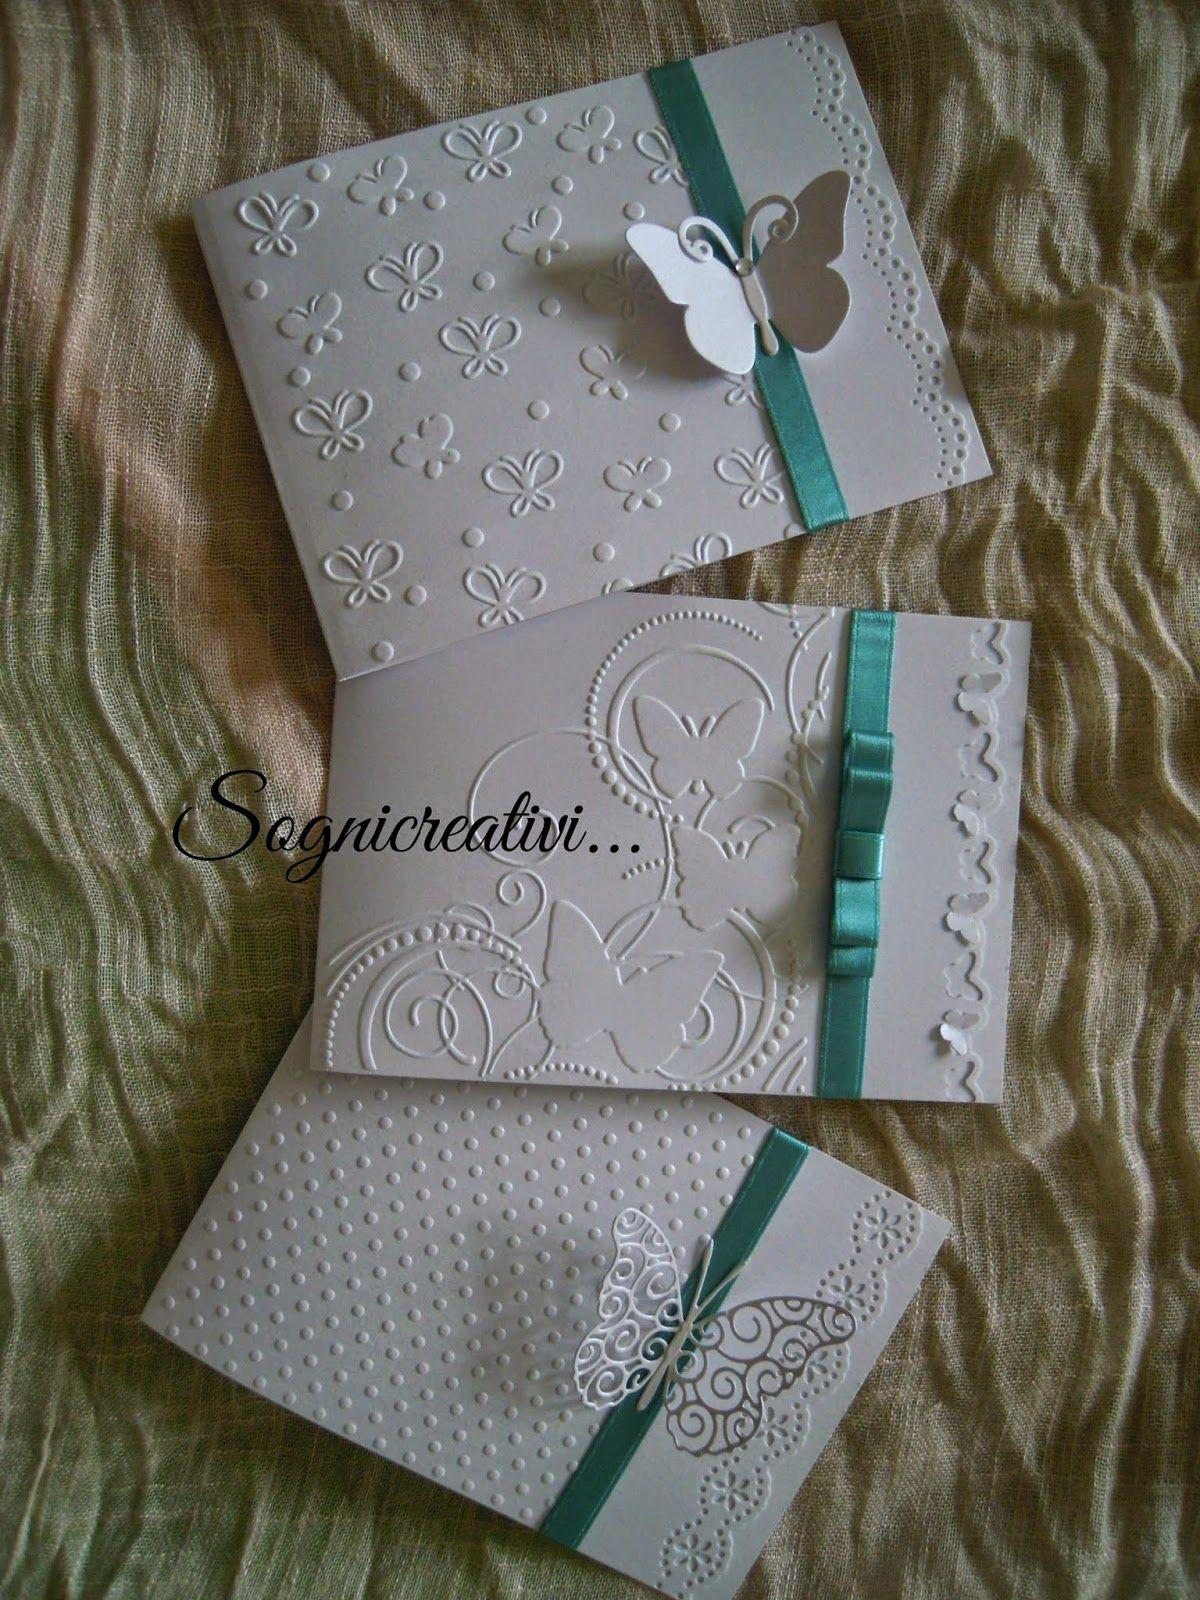 Partecipazioni Matrimonio Homemade.Sognicreativi Wedding And Events Partecipazioni Matrimonio E